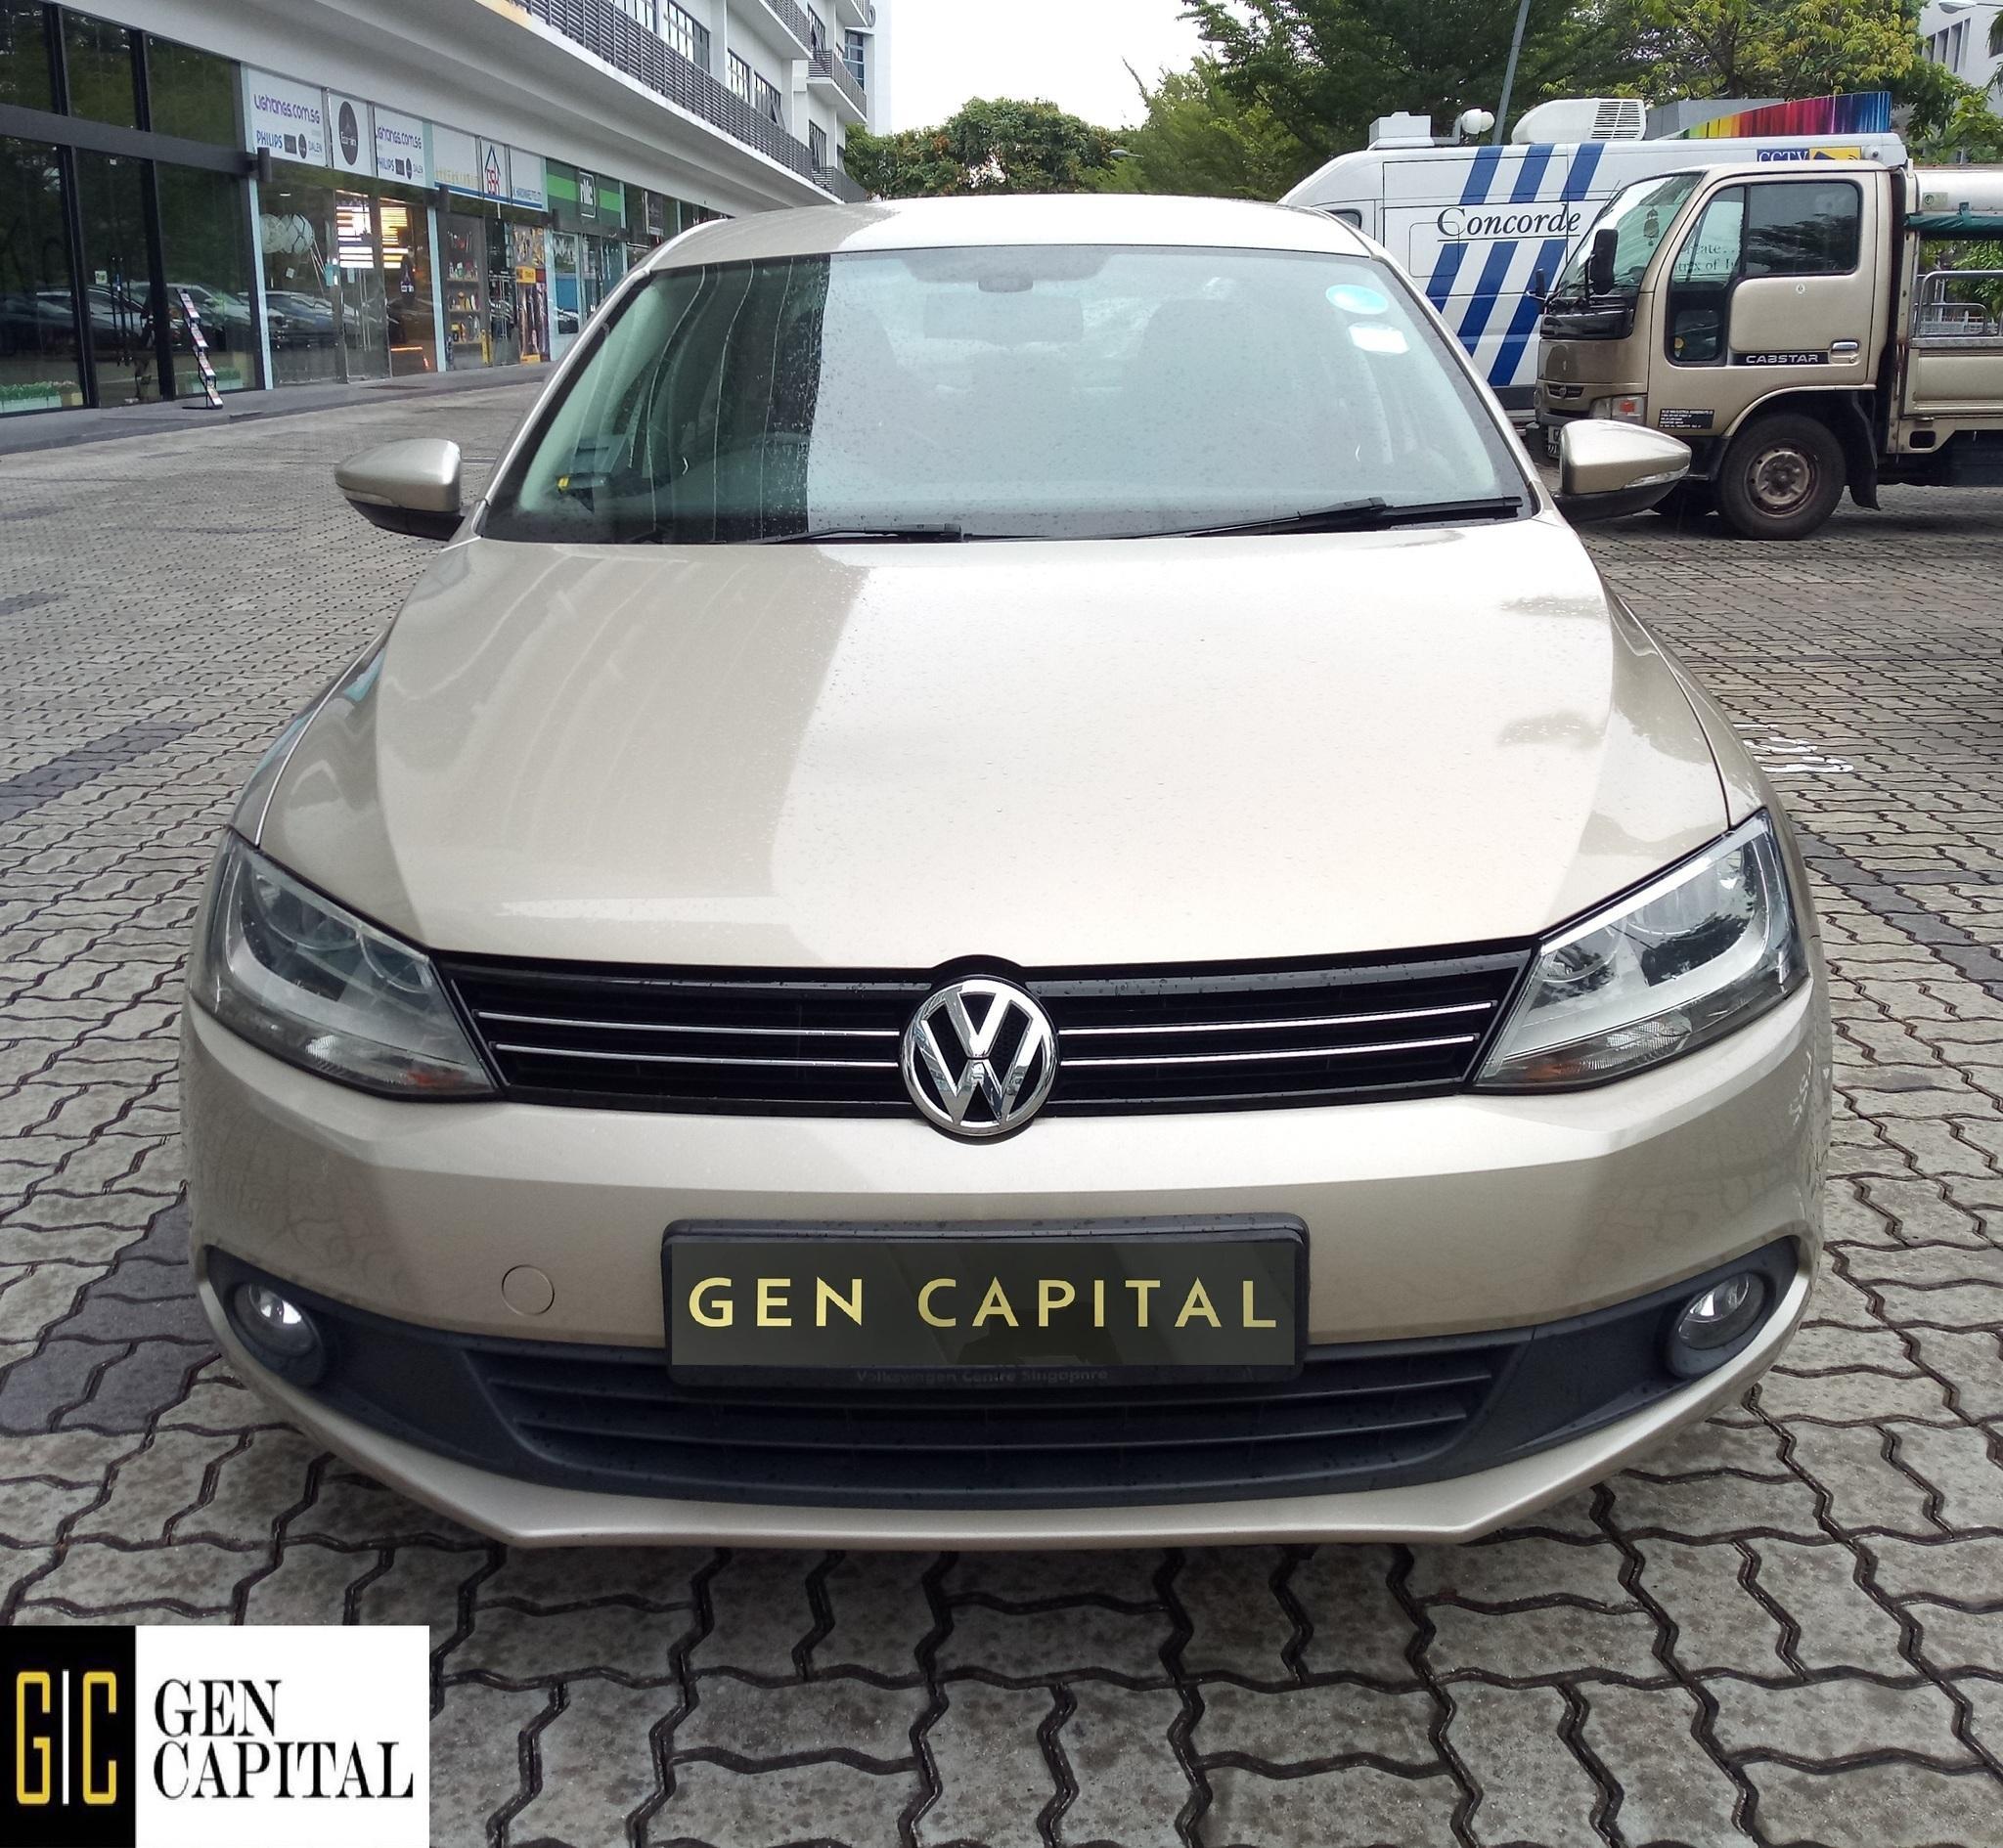 Volkswagen Jetta 1.4 TSI 2013 Superb Condition Car for Rental